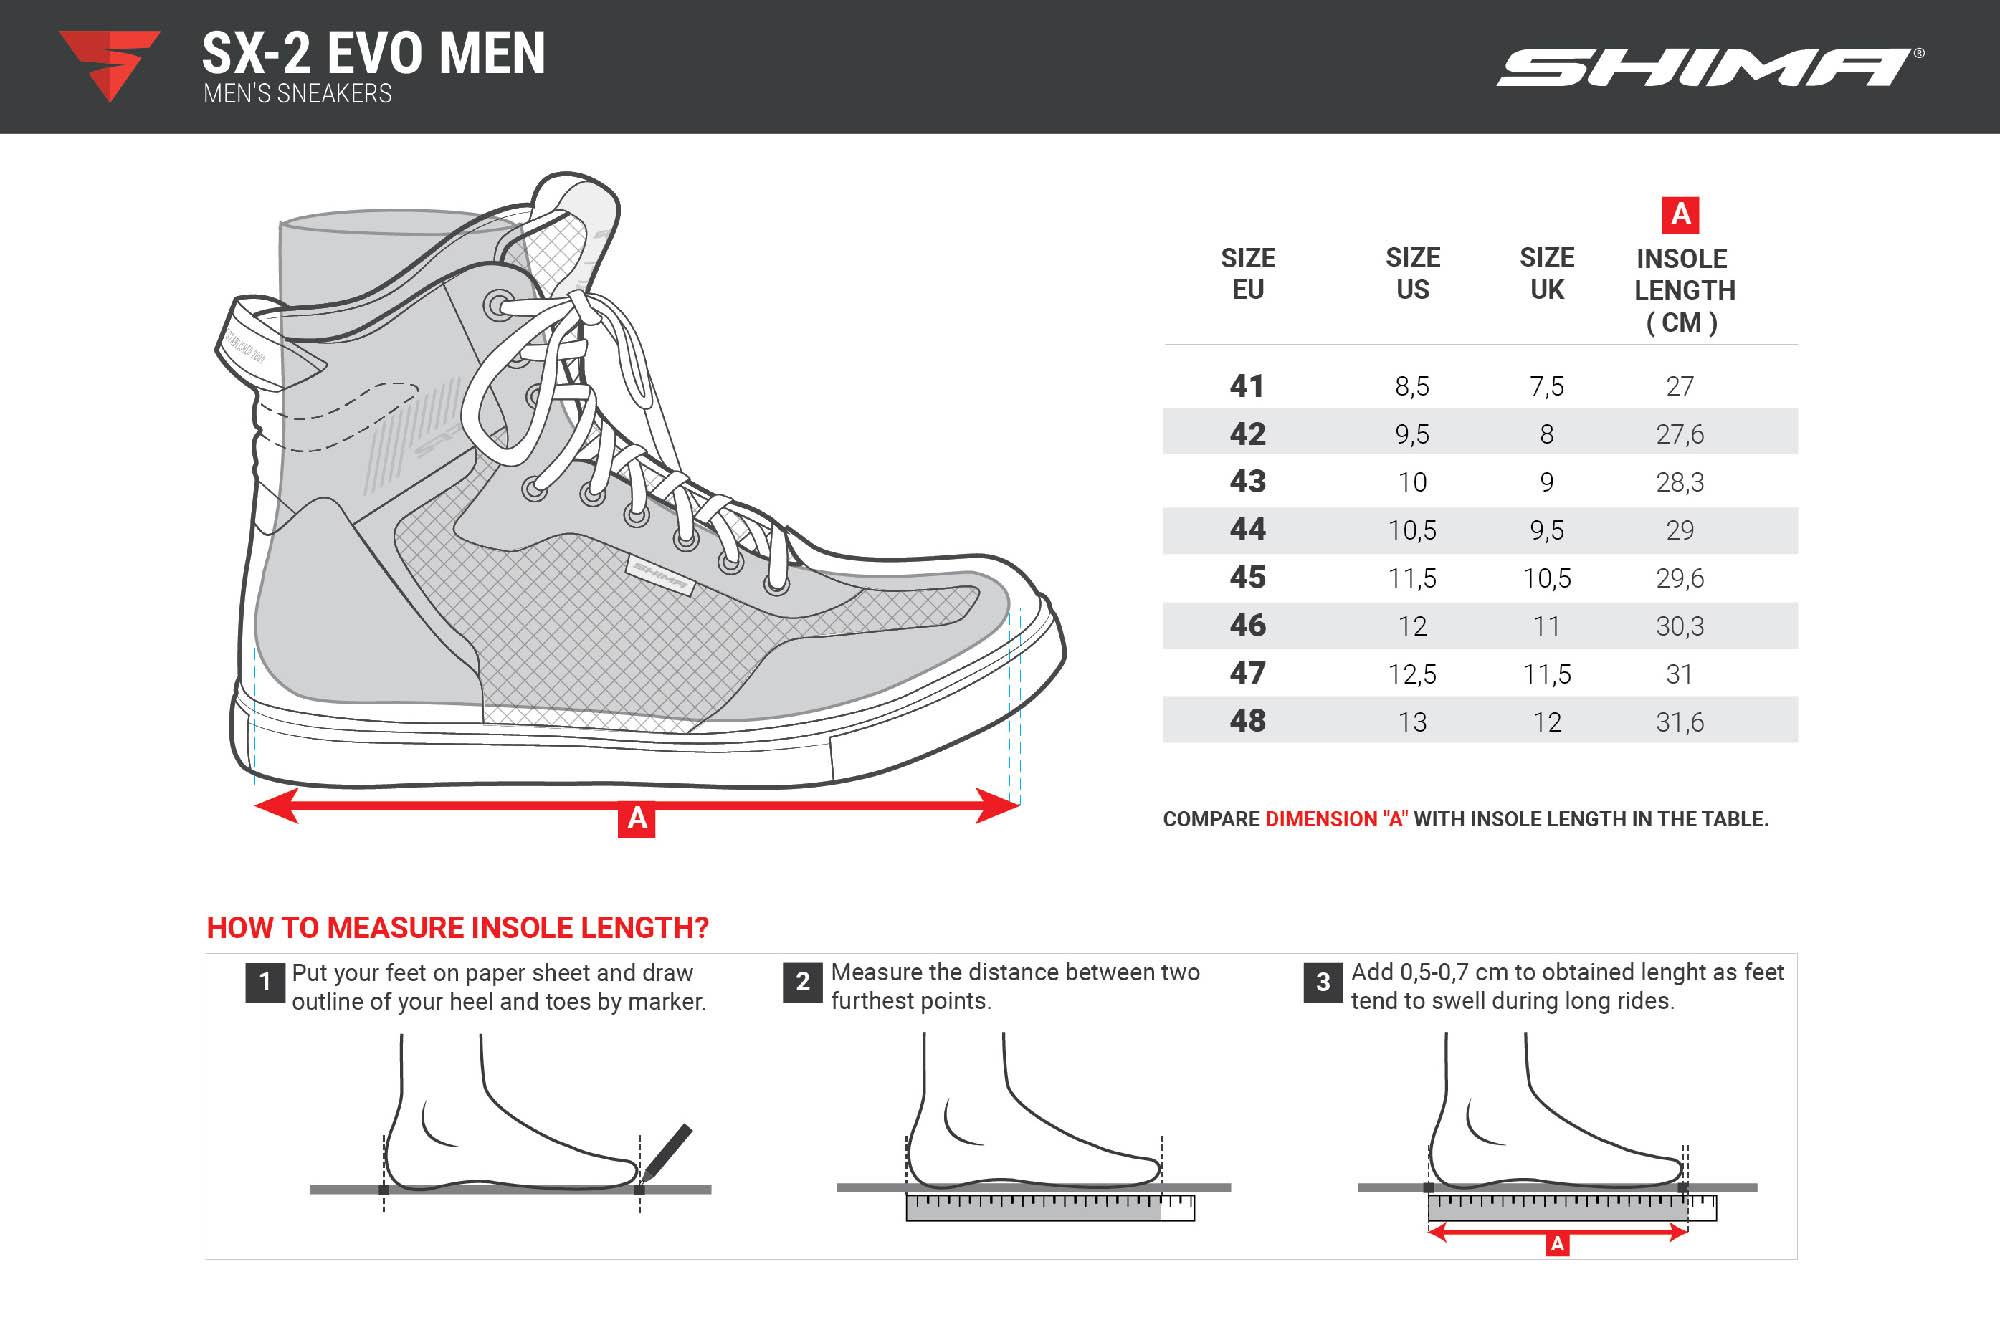 SHIMA SX-2 EVO мотоциклетные кроссовки таблица размеров